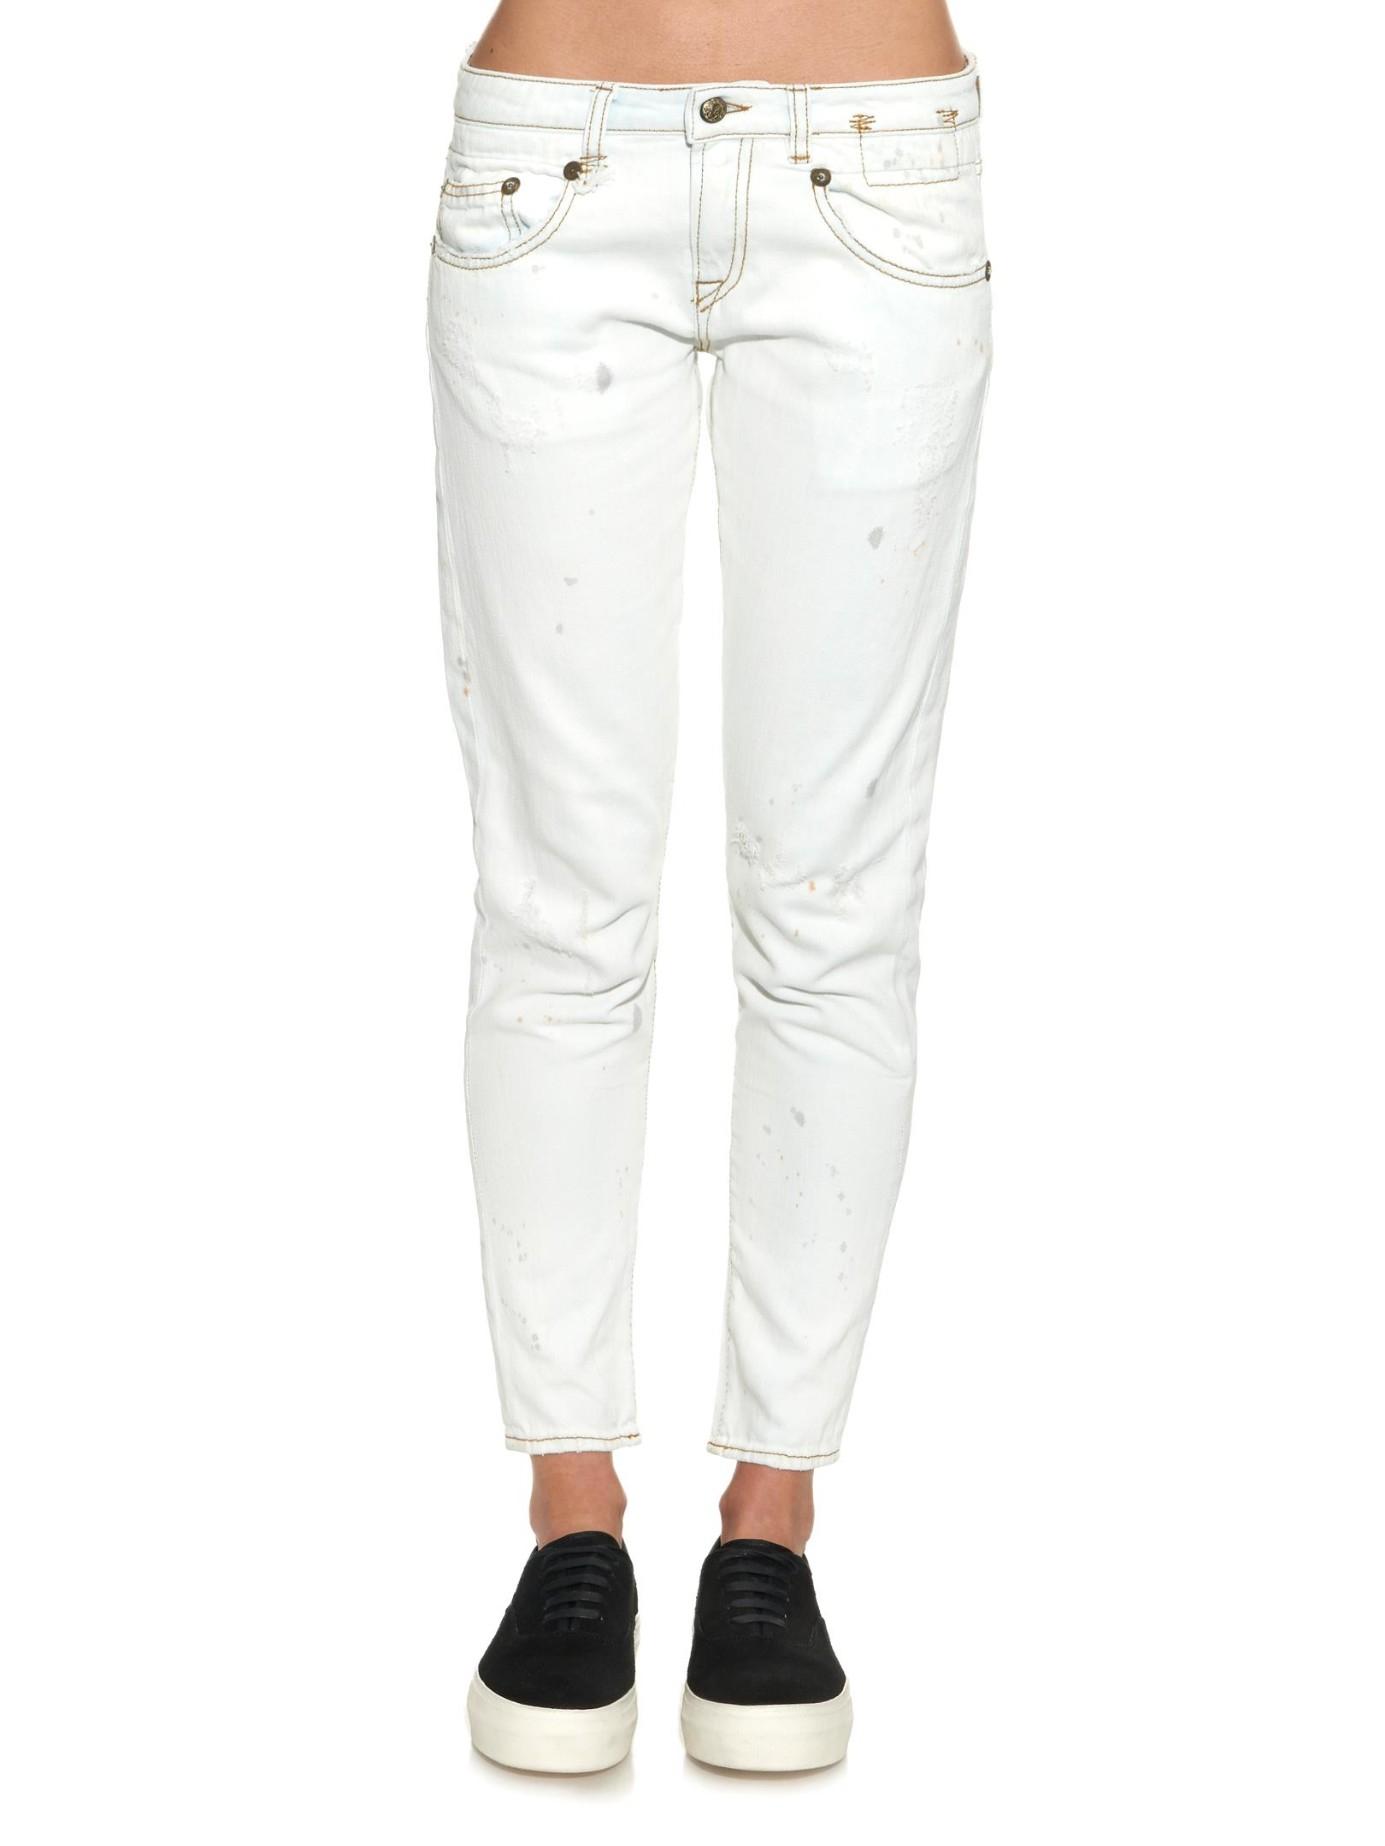 Boy Skinny Boyfriend Jeans - Ivory R13 Sale Deals h6COIB